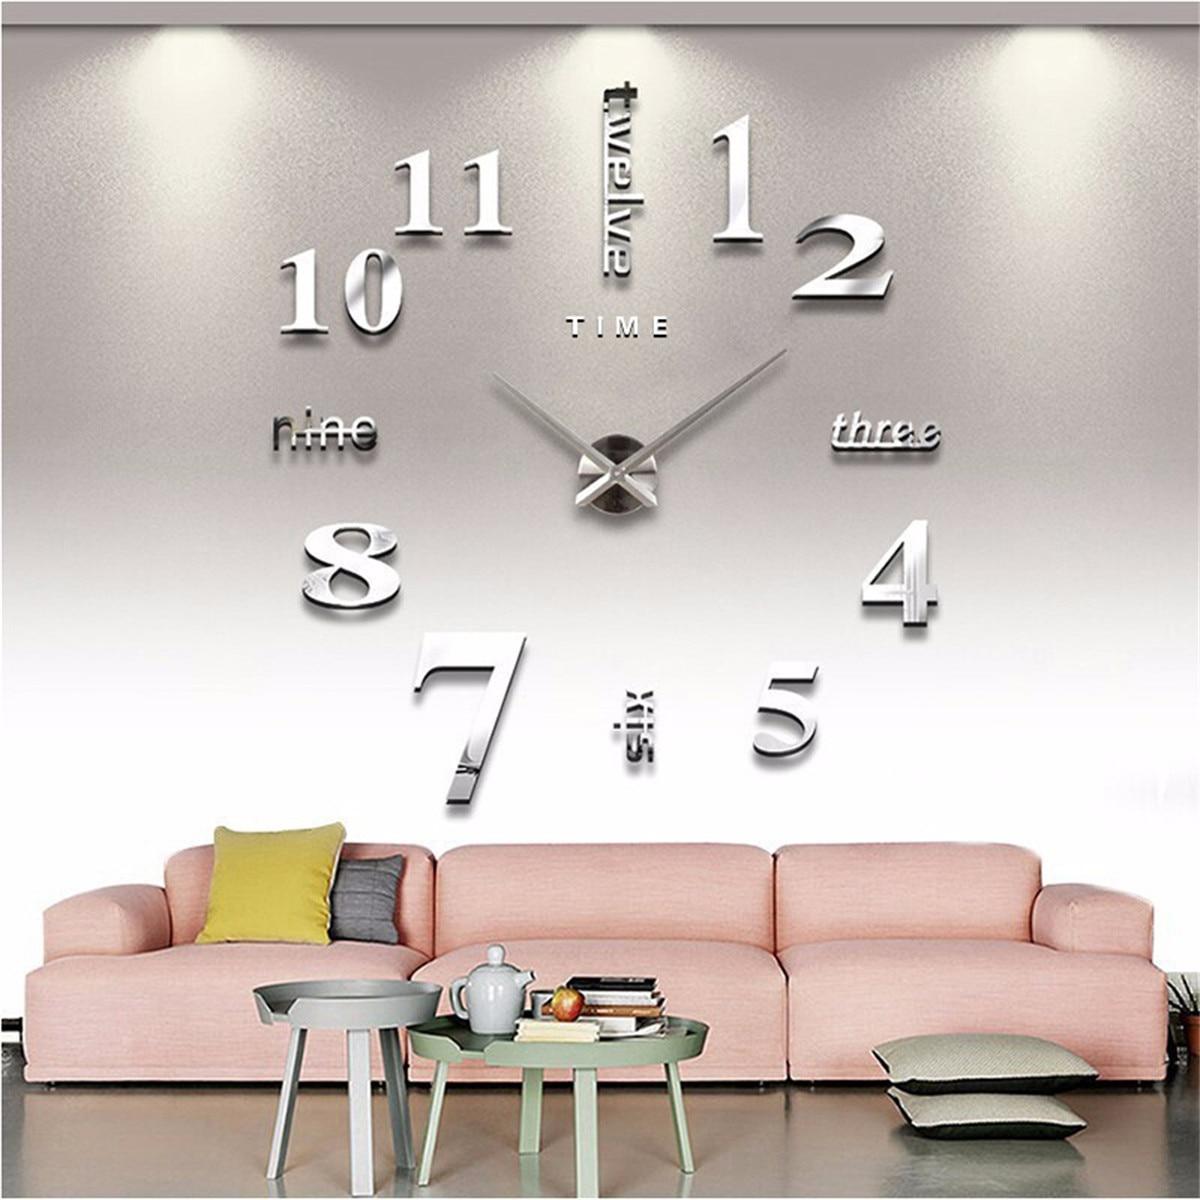 3D Wall Clock Mirror Wall Stickers Creative DIY Wall Clocks Removable Art Decal Sticker Home Decor Living Room Quartz Needle Hot(China)